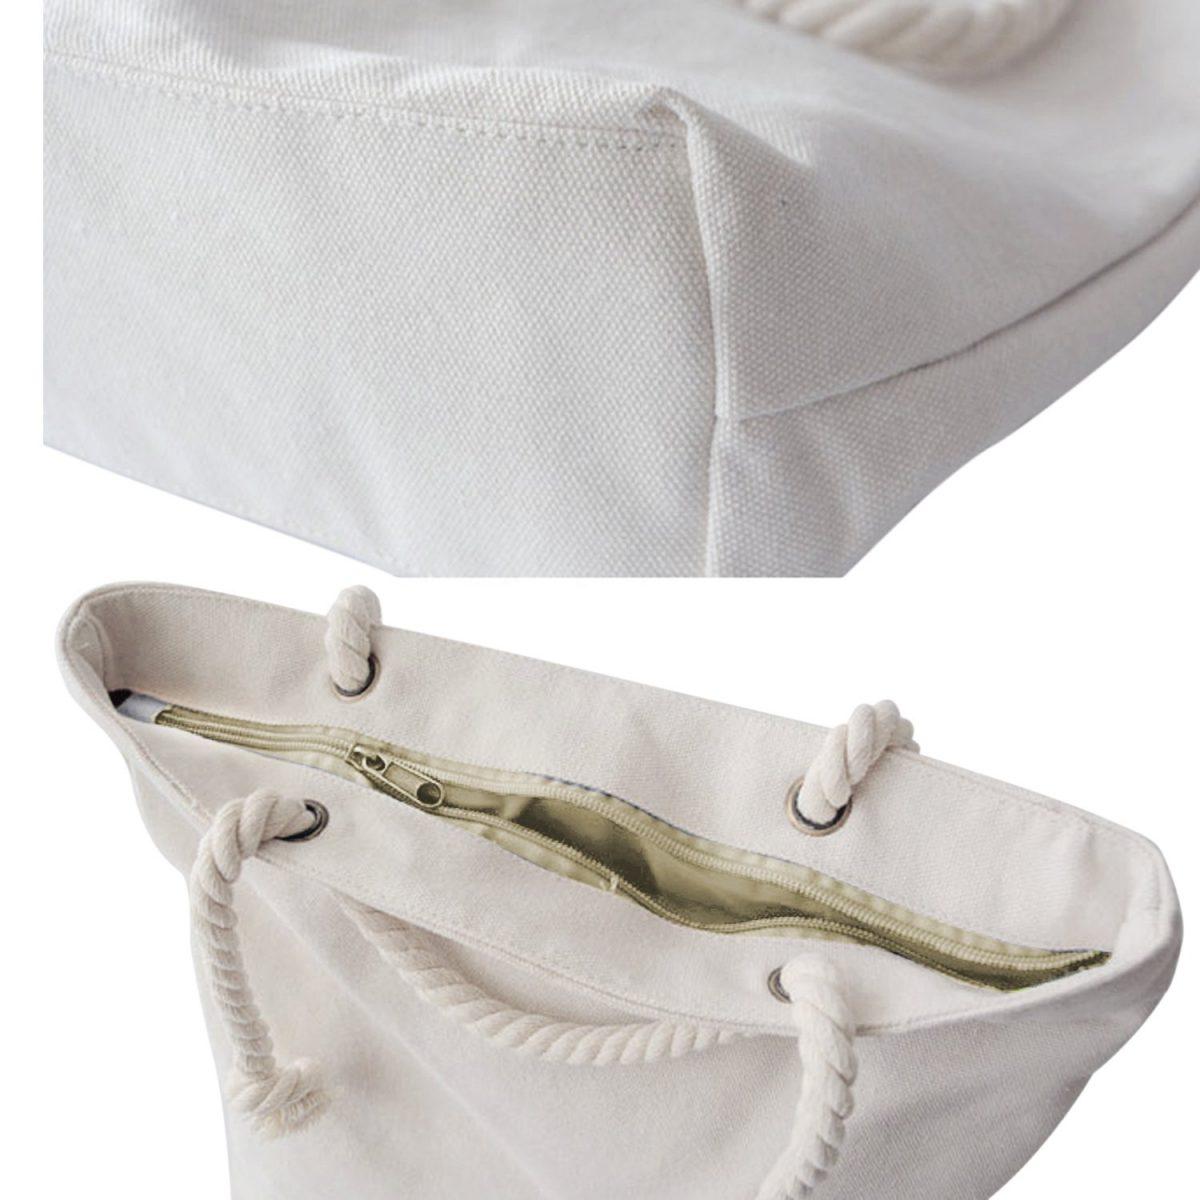 Lacivert Zeminli Leopar Özel Tasarım Fermuarlı Modern Kumaş Çanta Realhomes